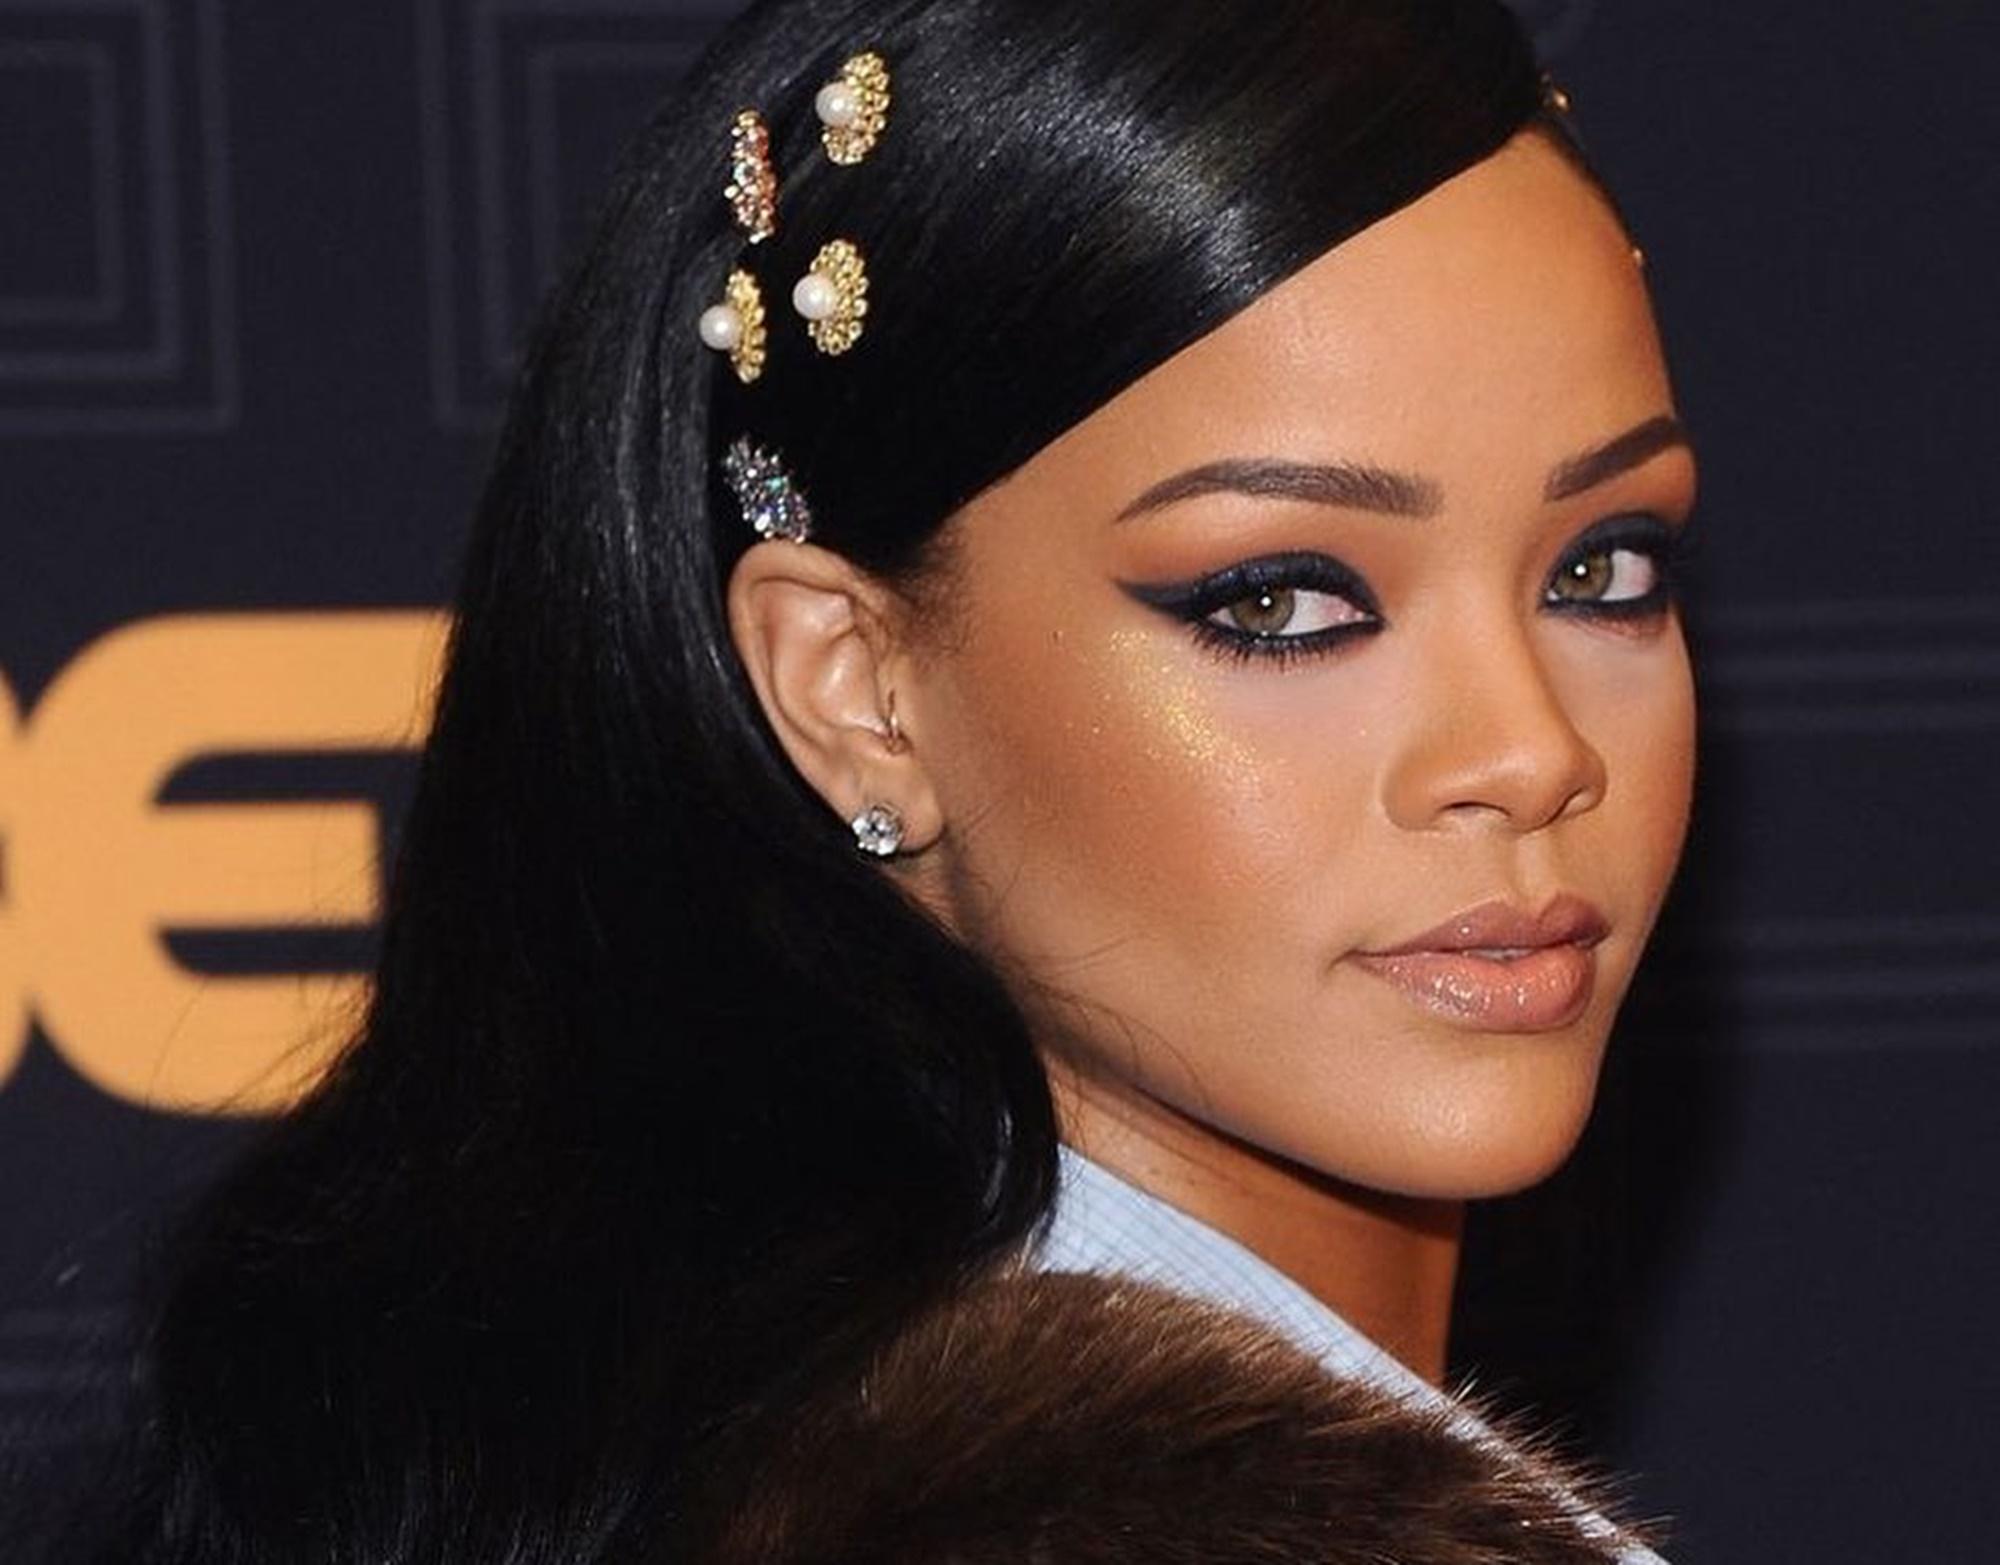 Rihanna New Album The Navy